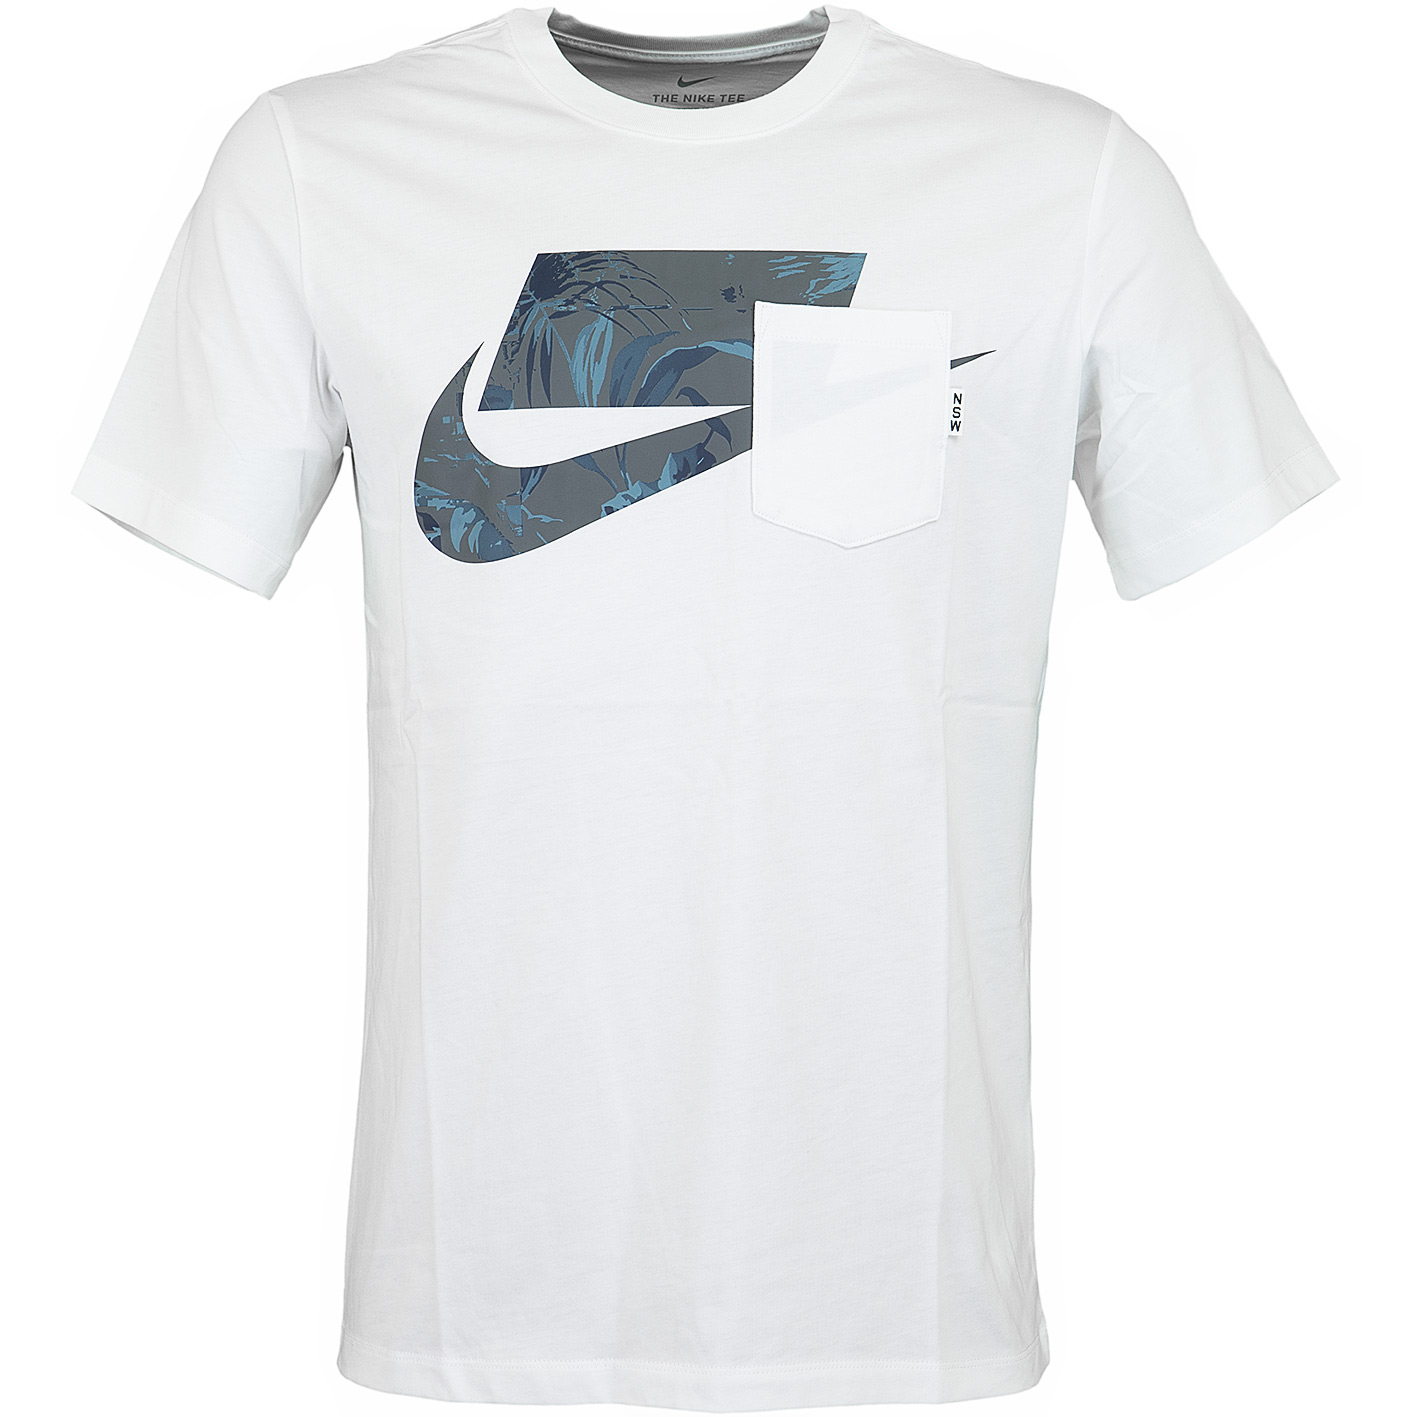 Nike T Shirt Block weißgrau